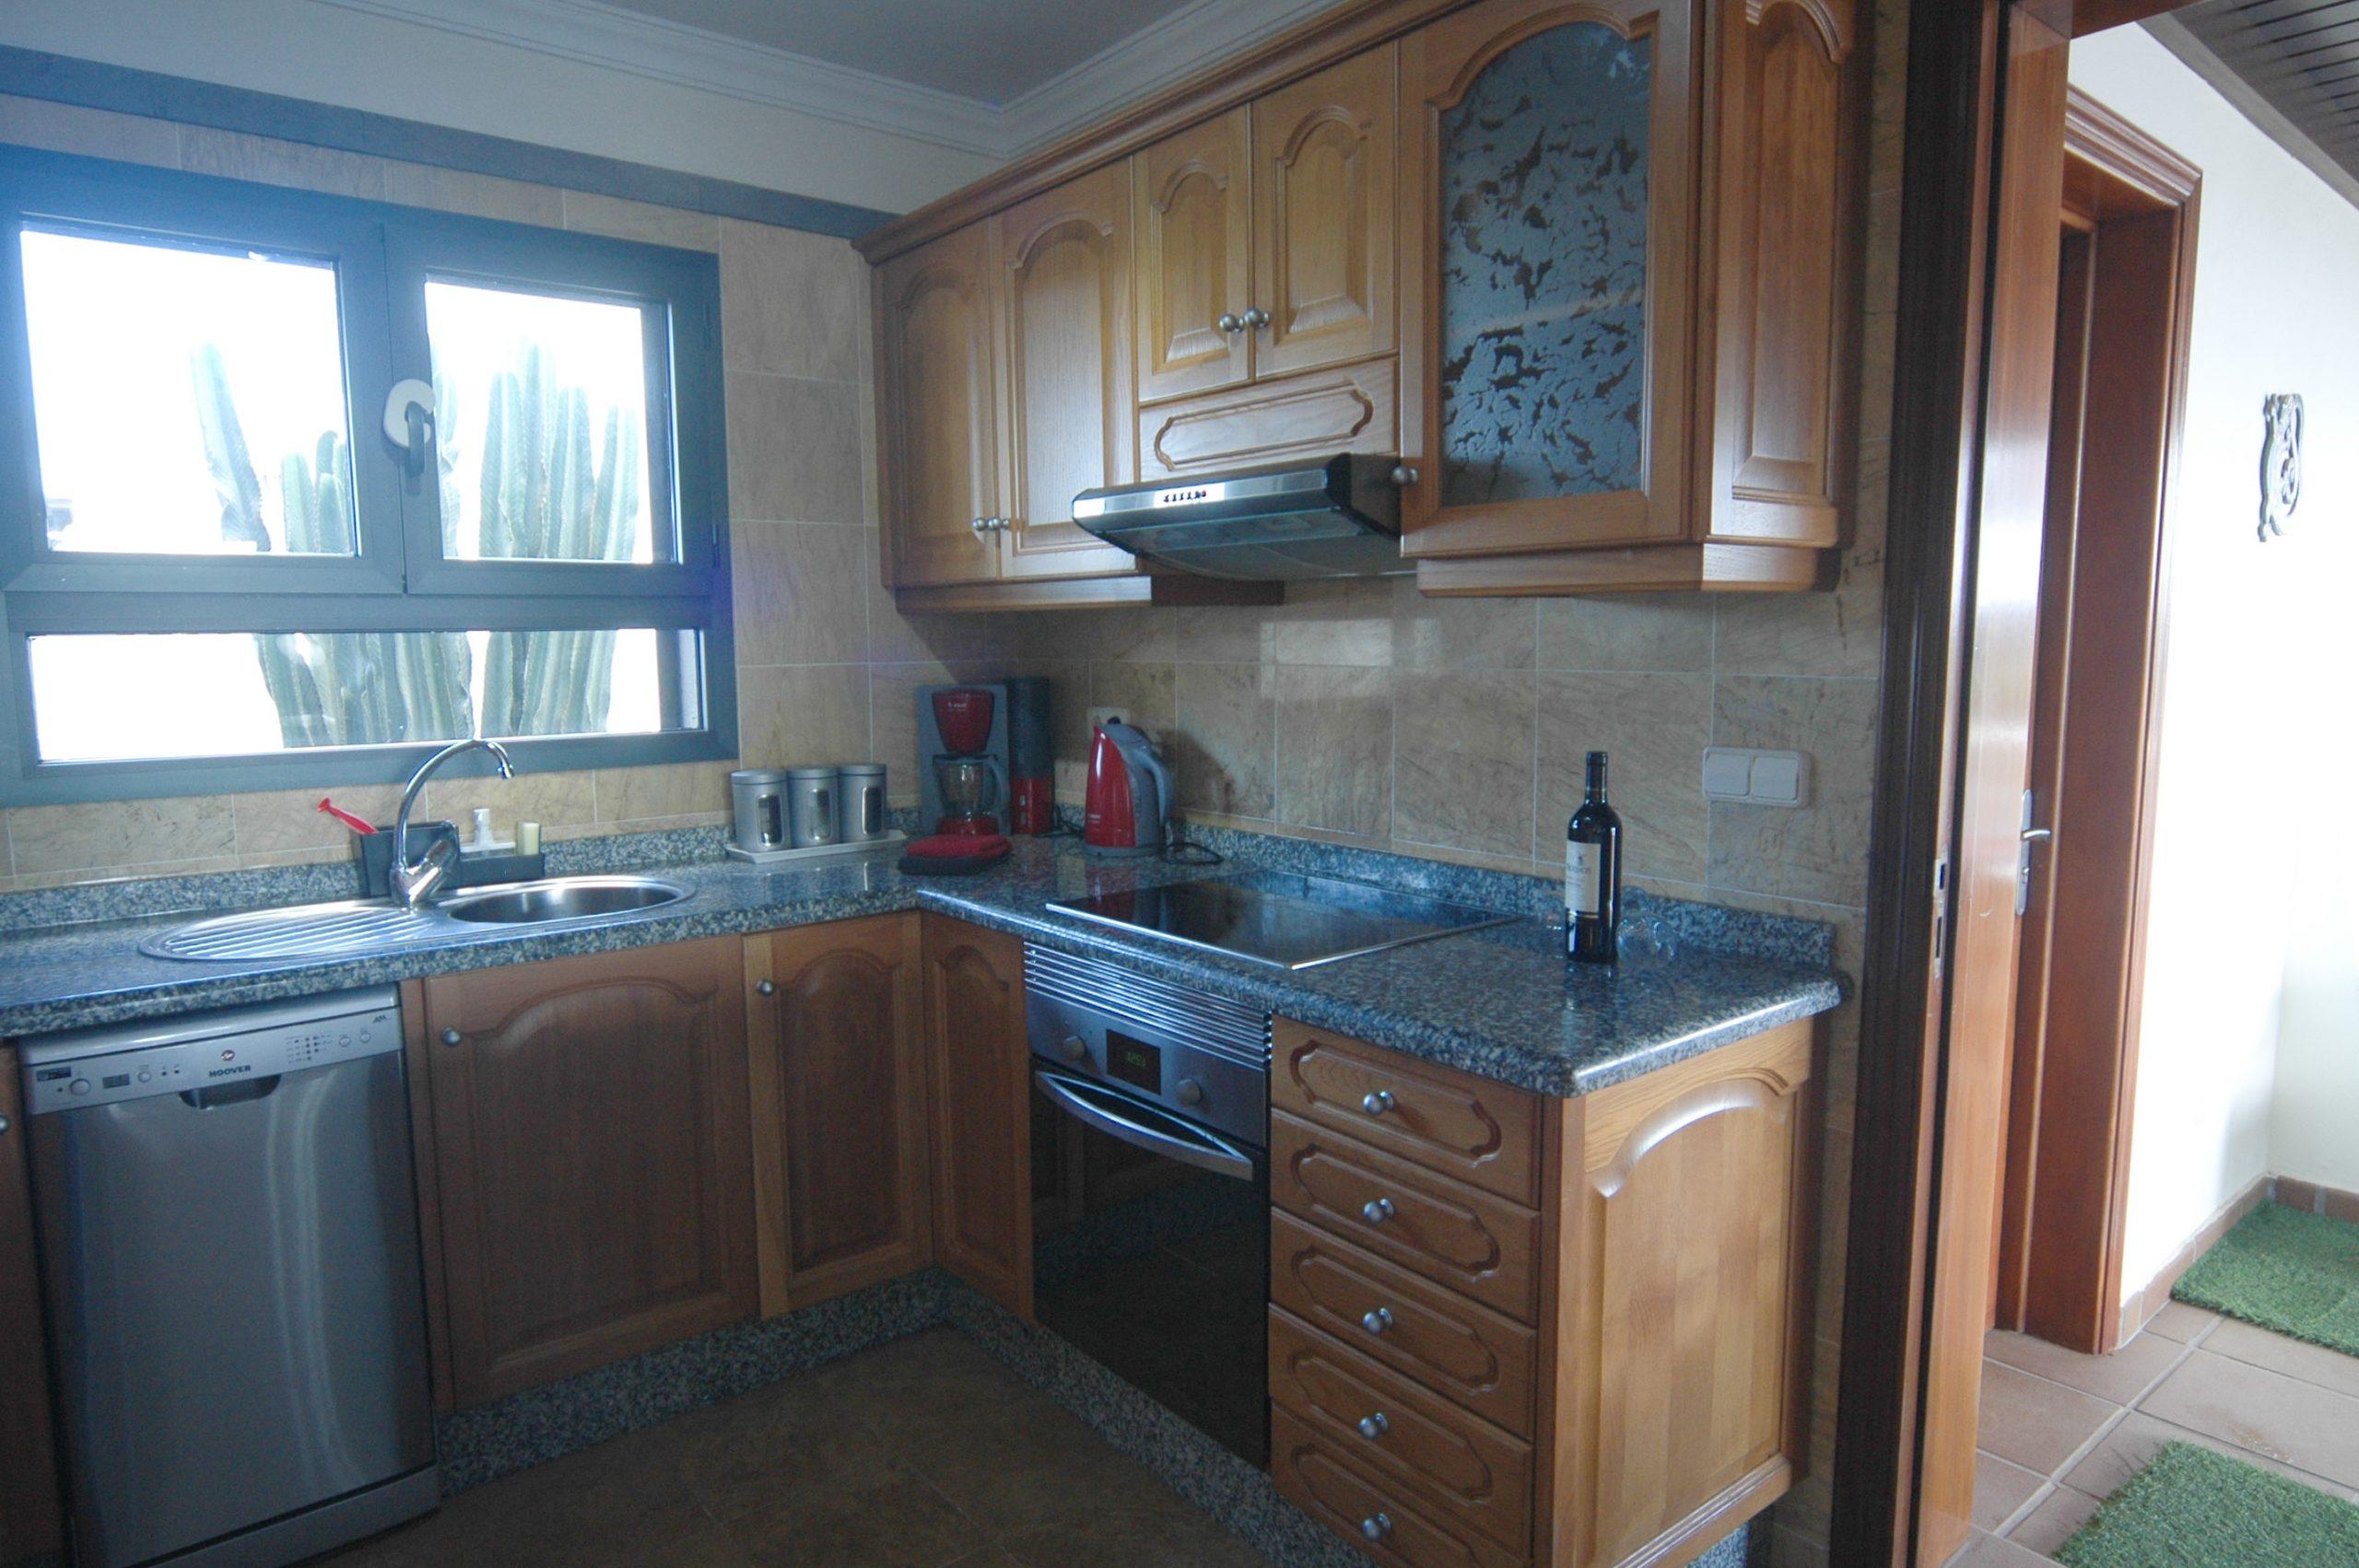 Villa_LVC338912 - Playa Blanca Villa kitchen with all mod cons